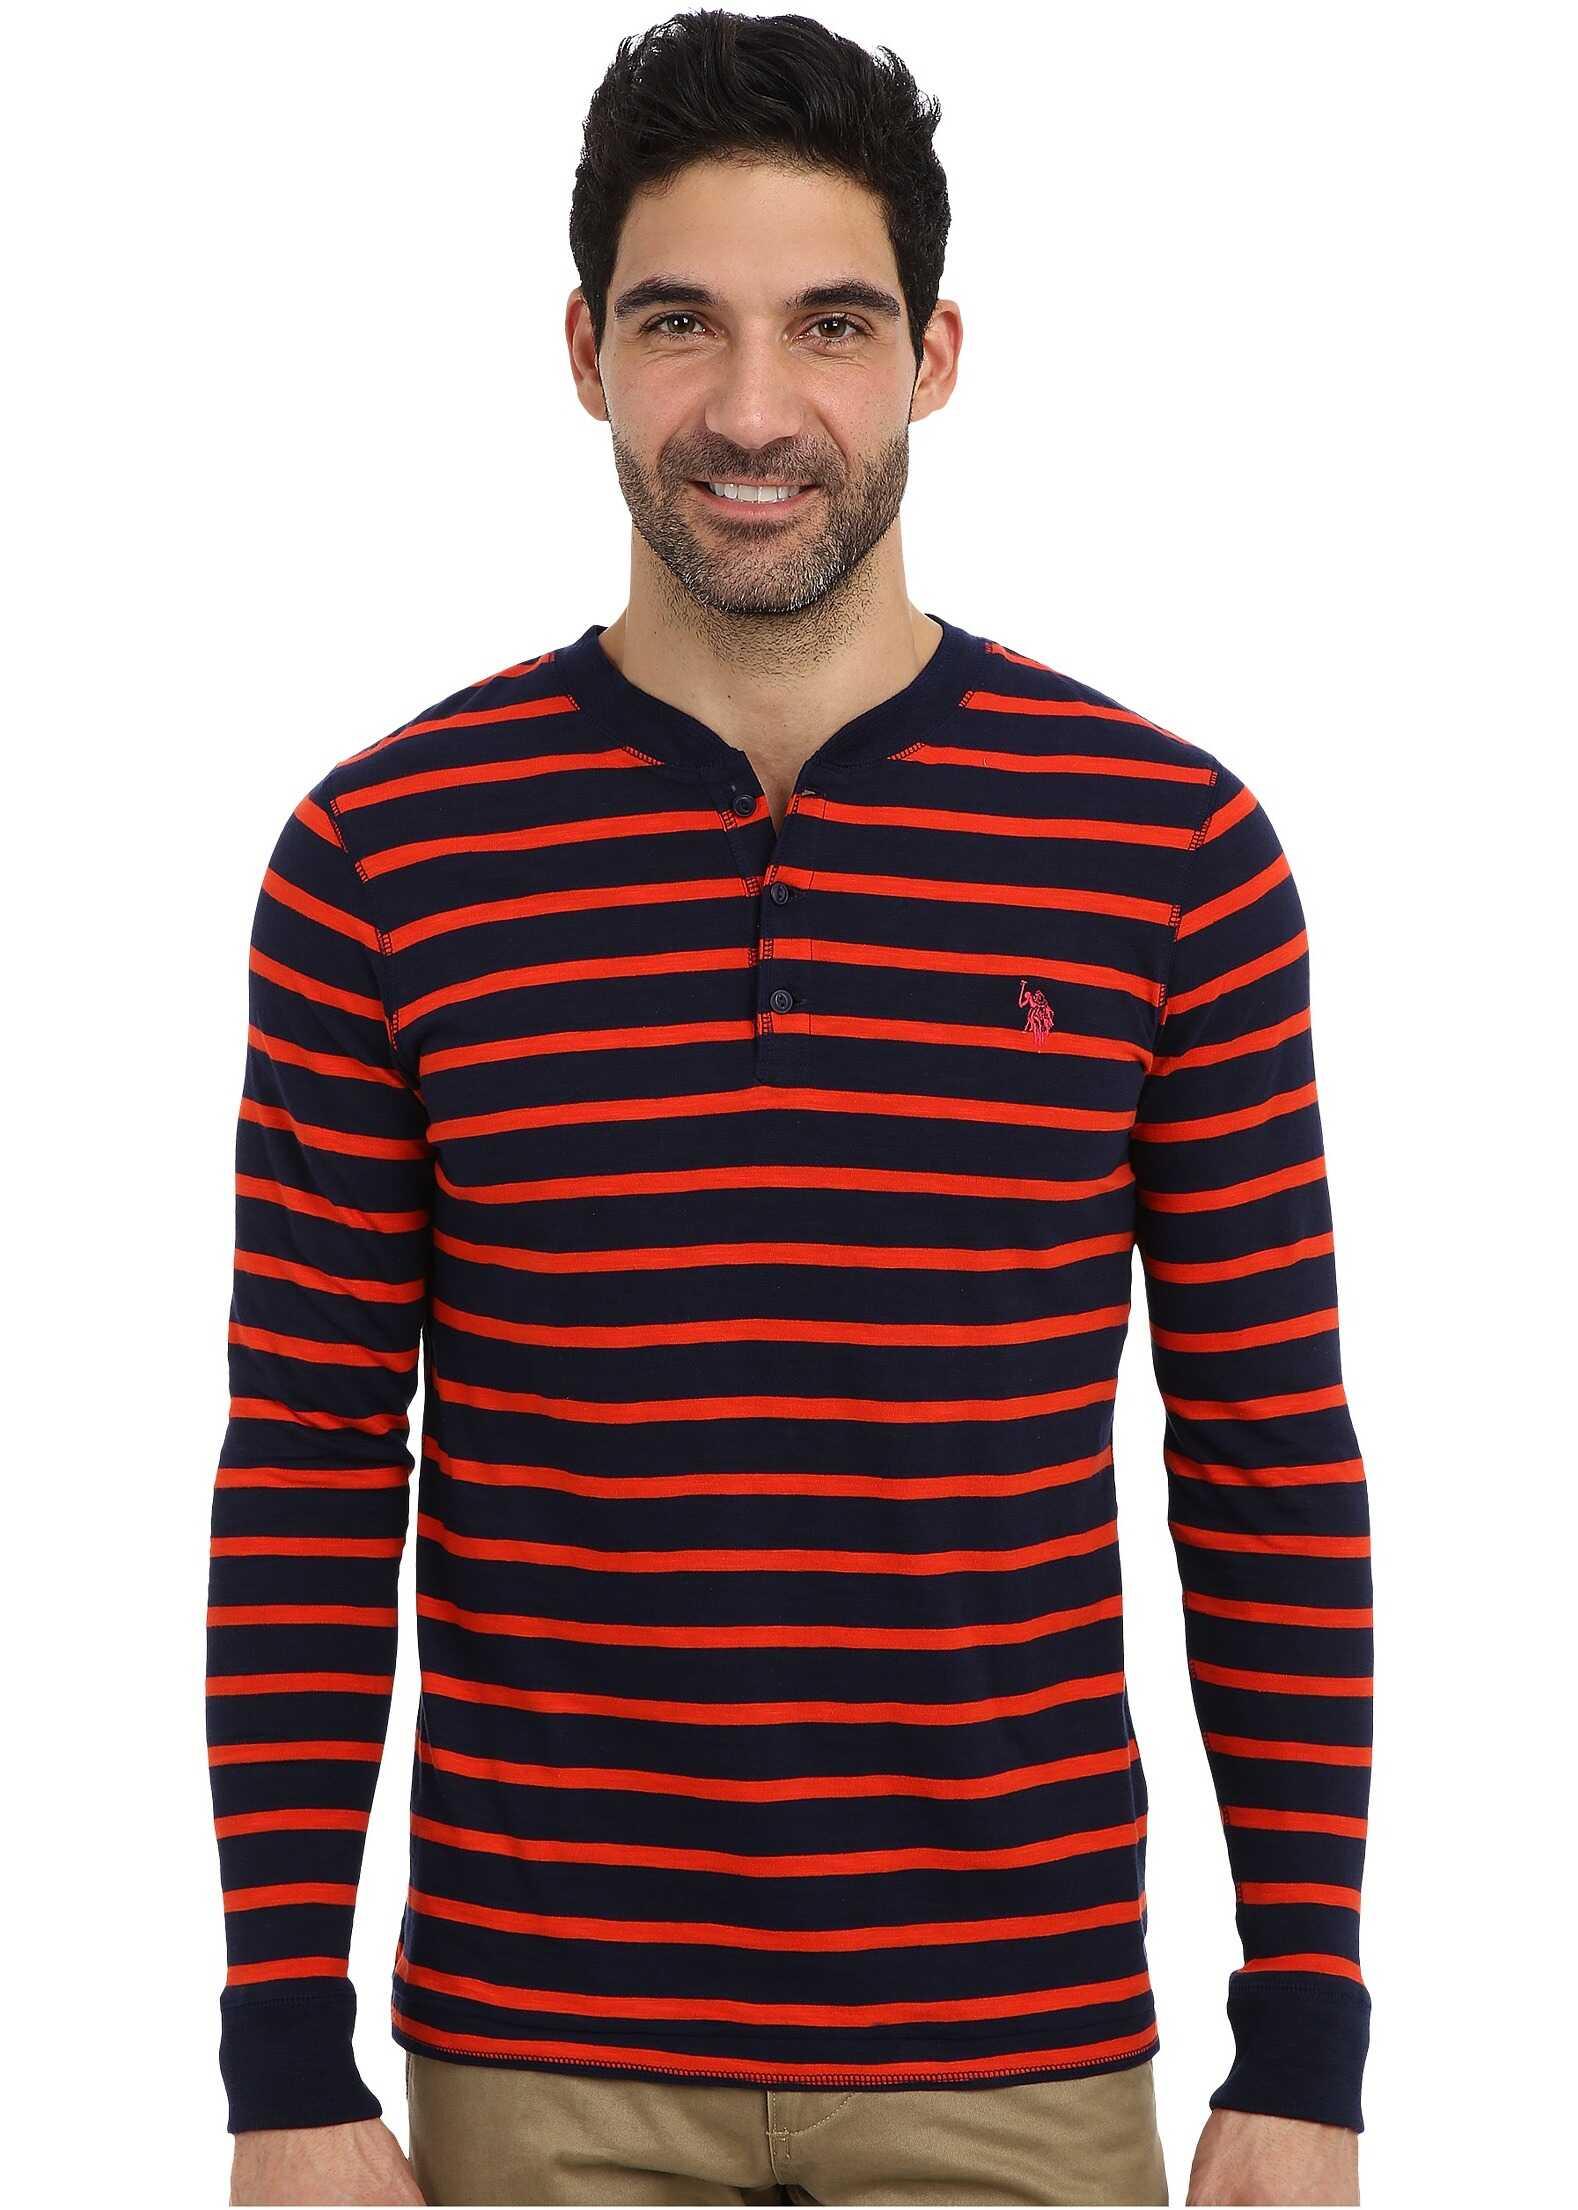 U.S. POLO ASSN. Slim Fit Long Sleeve Slub Henley w/ Stripes Harvest Orange